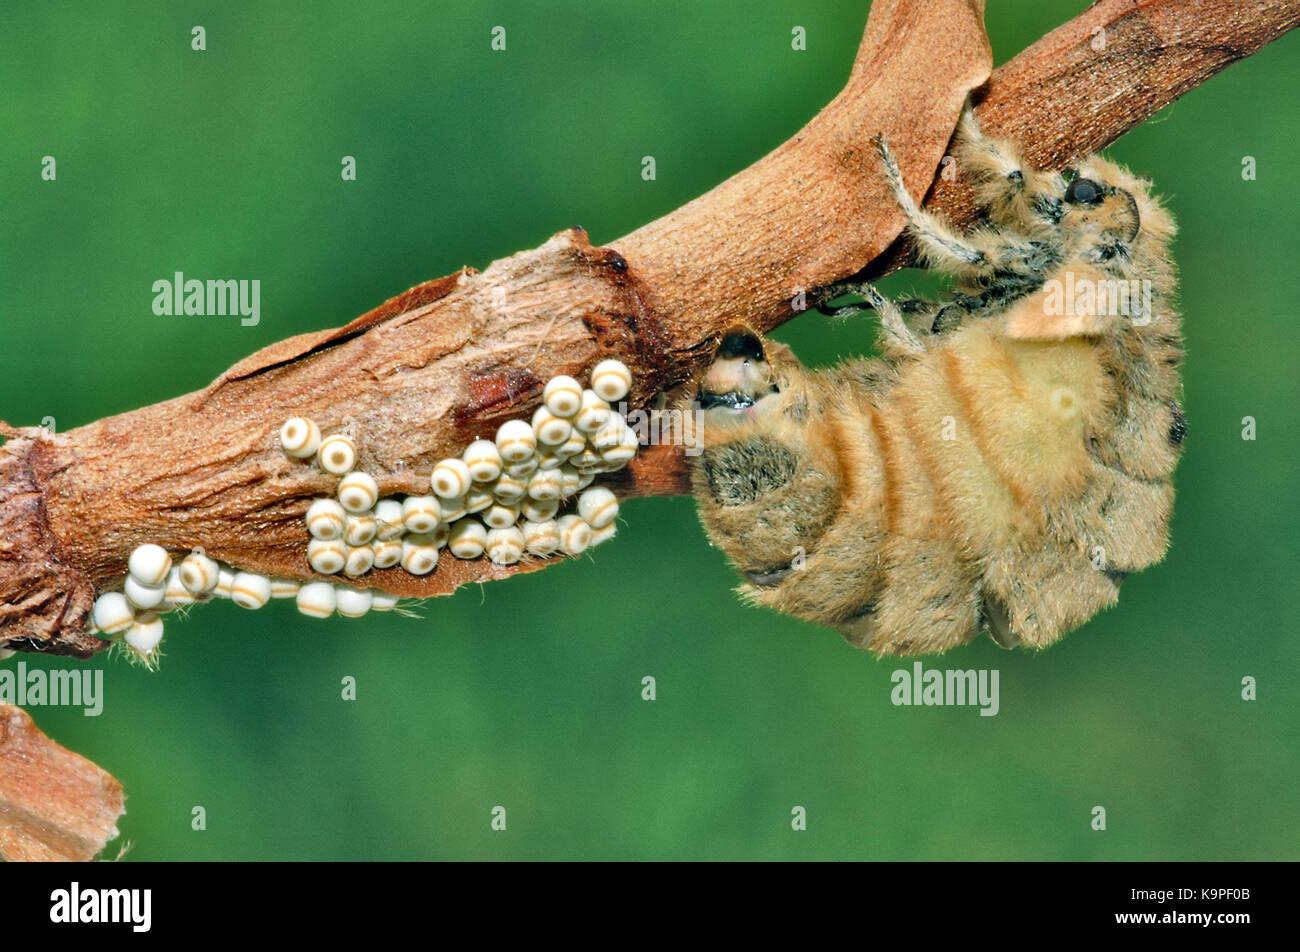 Vapourer moth (Orgyia antiqua) flightless female laying eggs - Stock Image